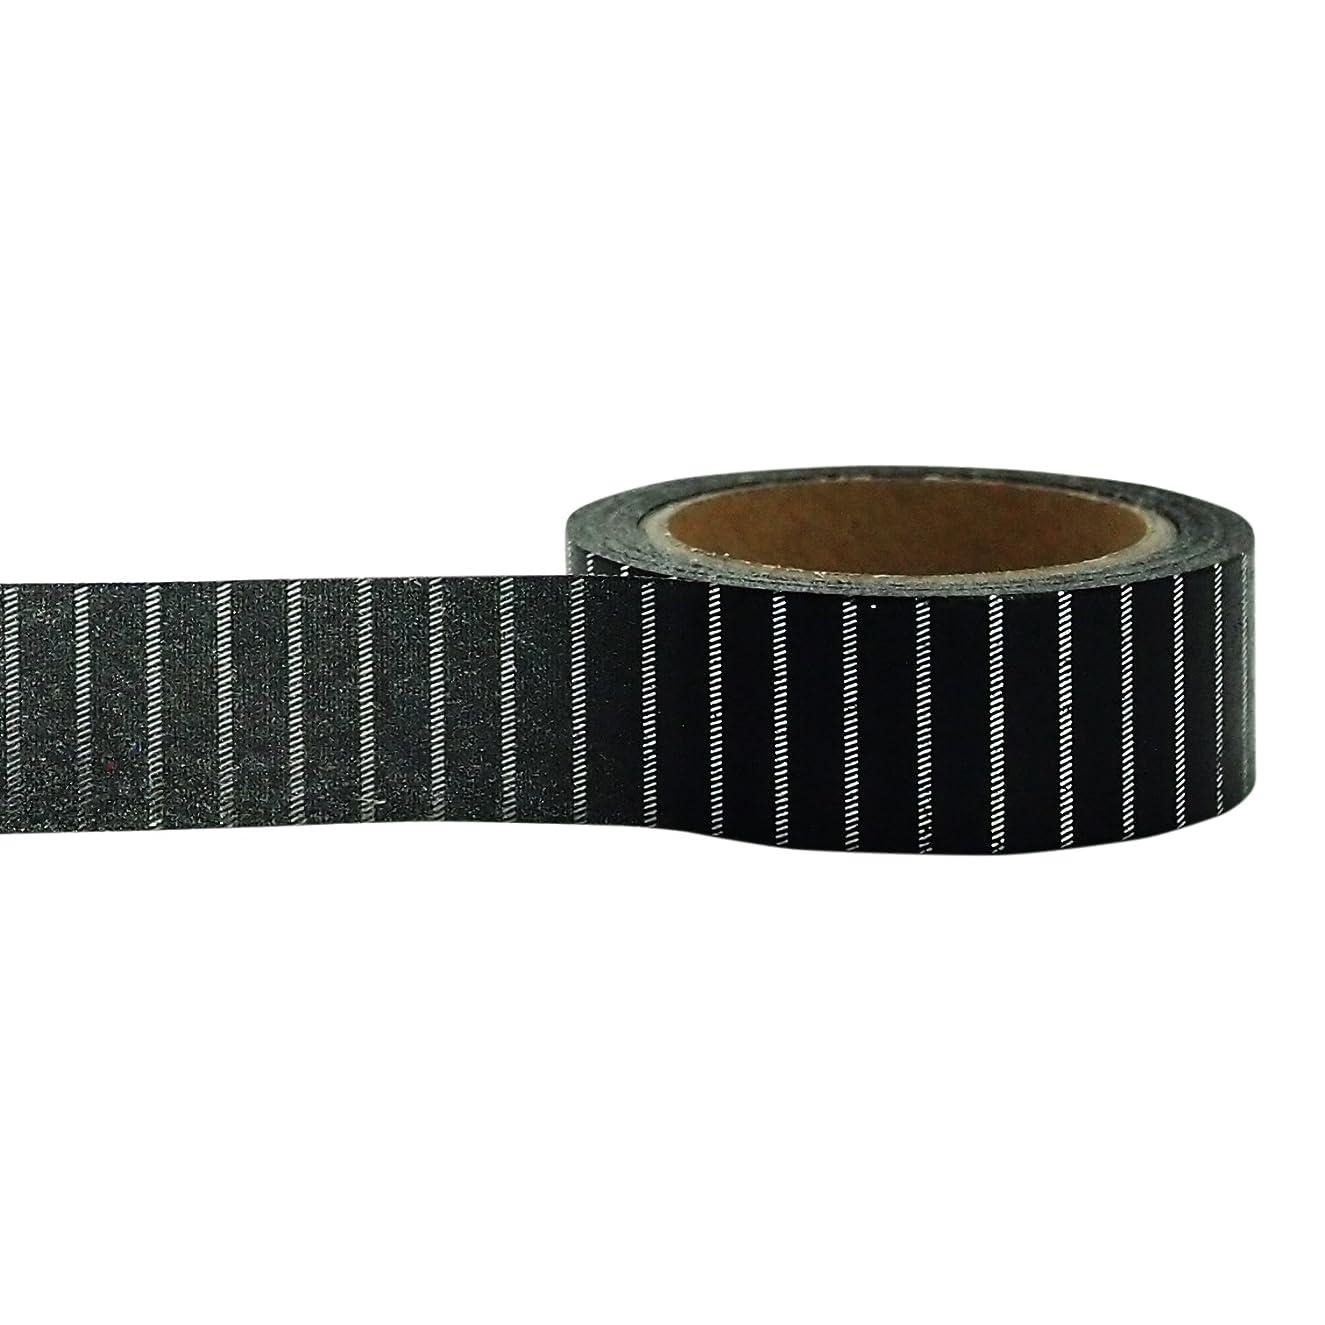 Little B 100435 Decorative Foil Paper Tape, Silver Black Pin Stripe